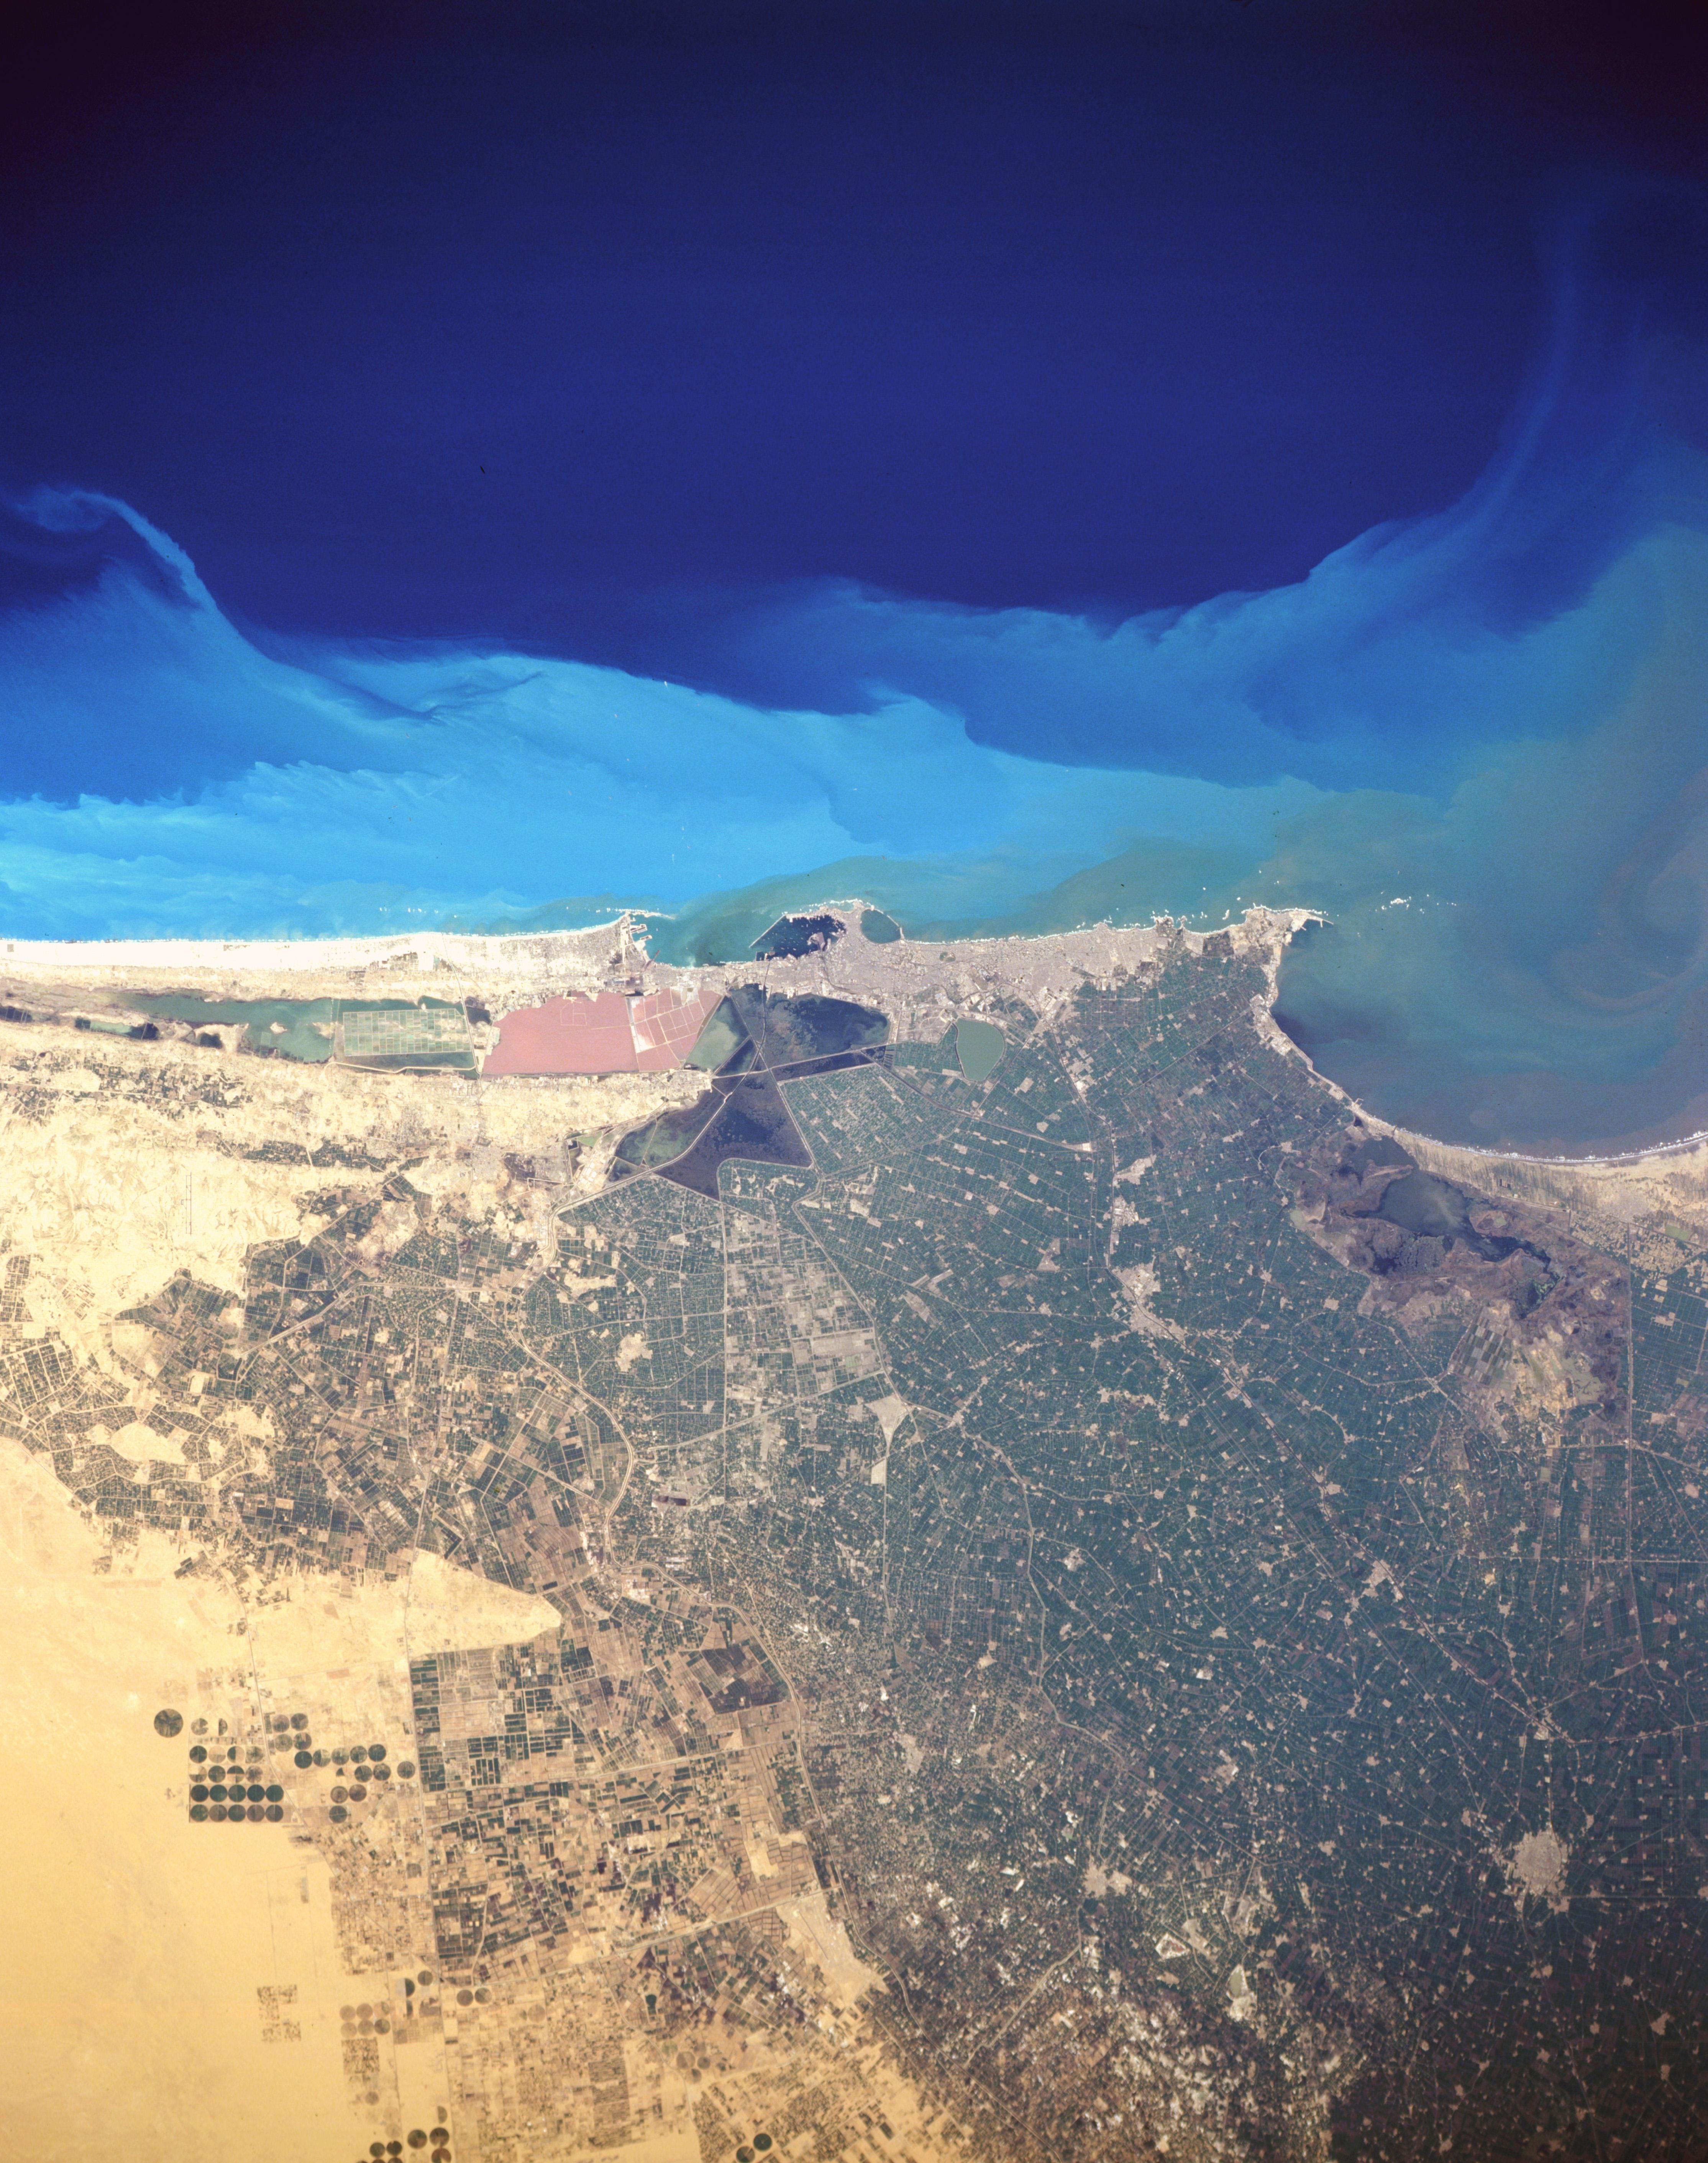 File:Alexandria egypt.jpg